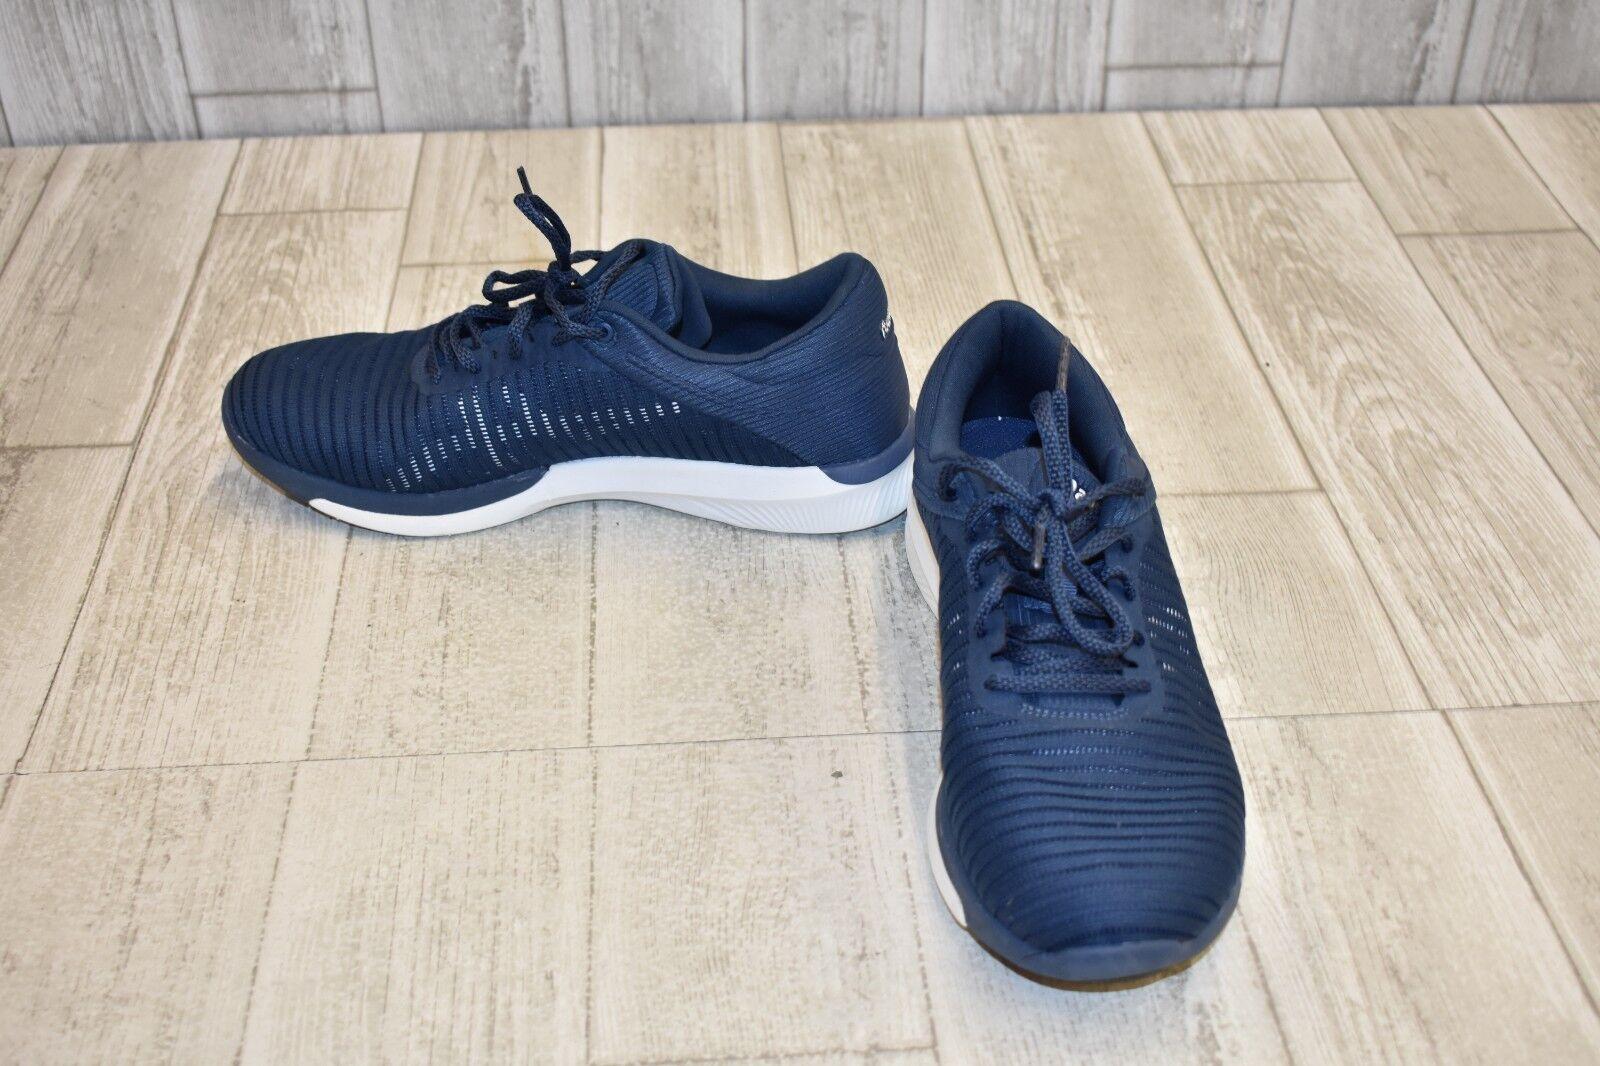 Nuevo Para Hombres Adidas Galaxy 3 Correr M Ortholite Correr 3 Entrenadores Azul Marino/Amarillo 44e250